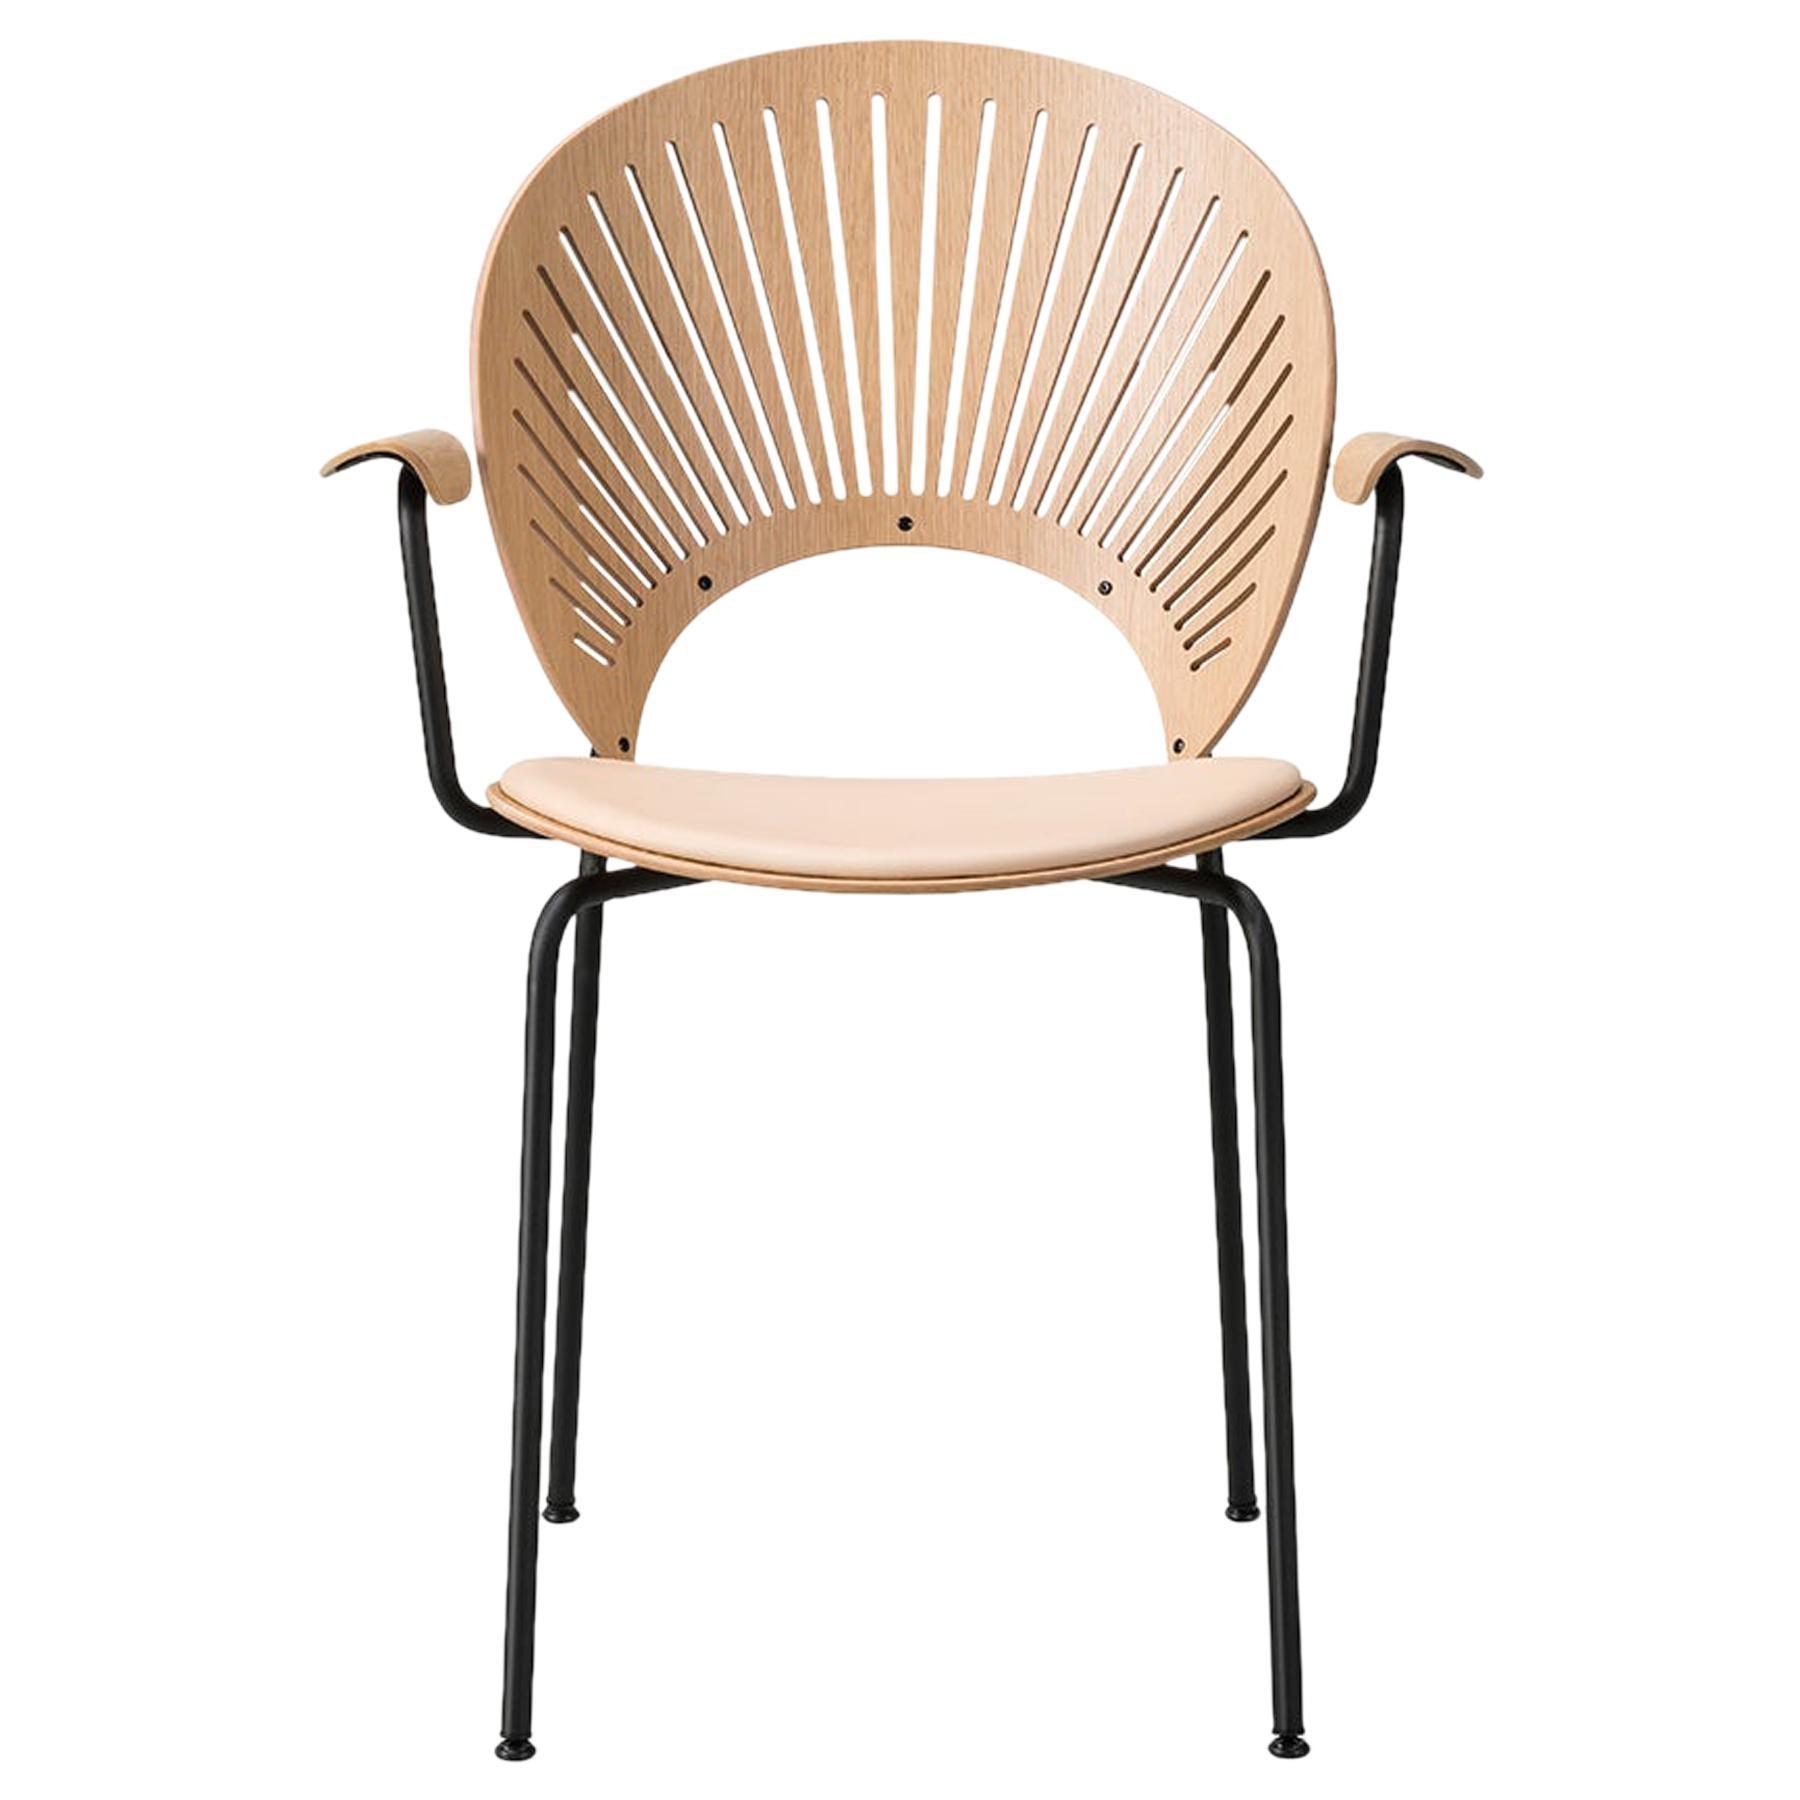 Nanna Ditzel Trinidad Armchair – Seat Upholstered